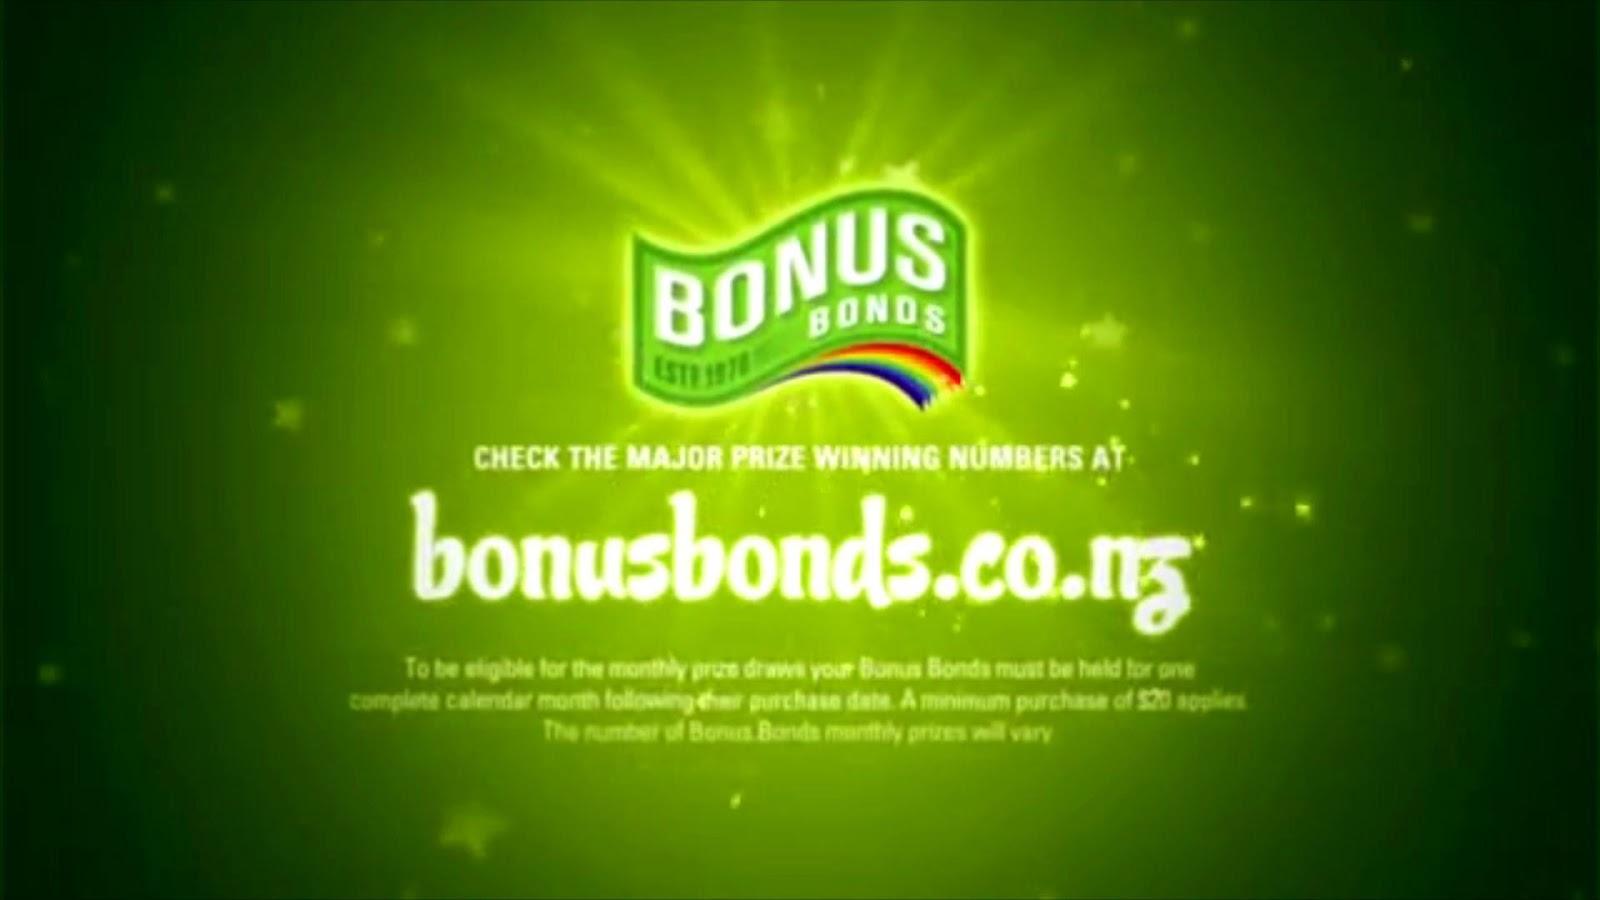 Lima Remaja Mendadak Jadi Miliarder Setelah Menang Undian Lotere